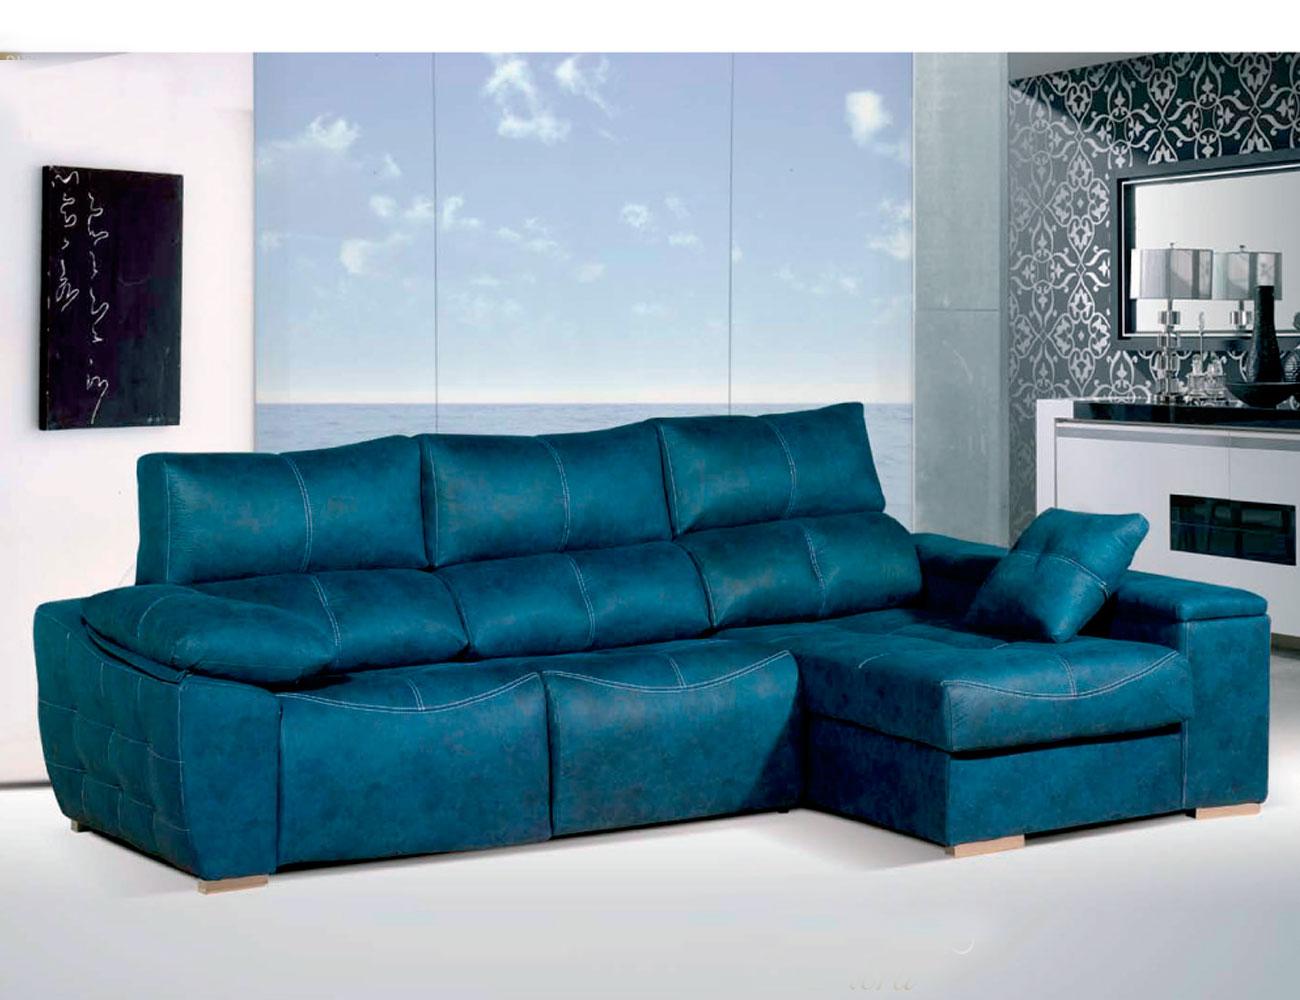 Sofa chaiselongue relax 2 motores anti manchas turquesa22